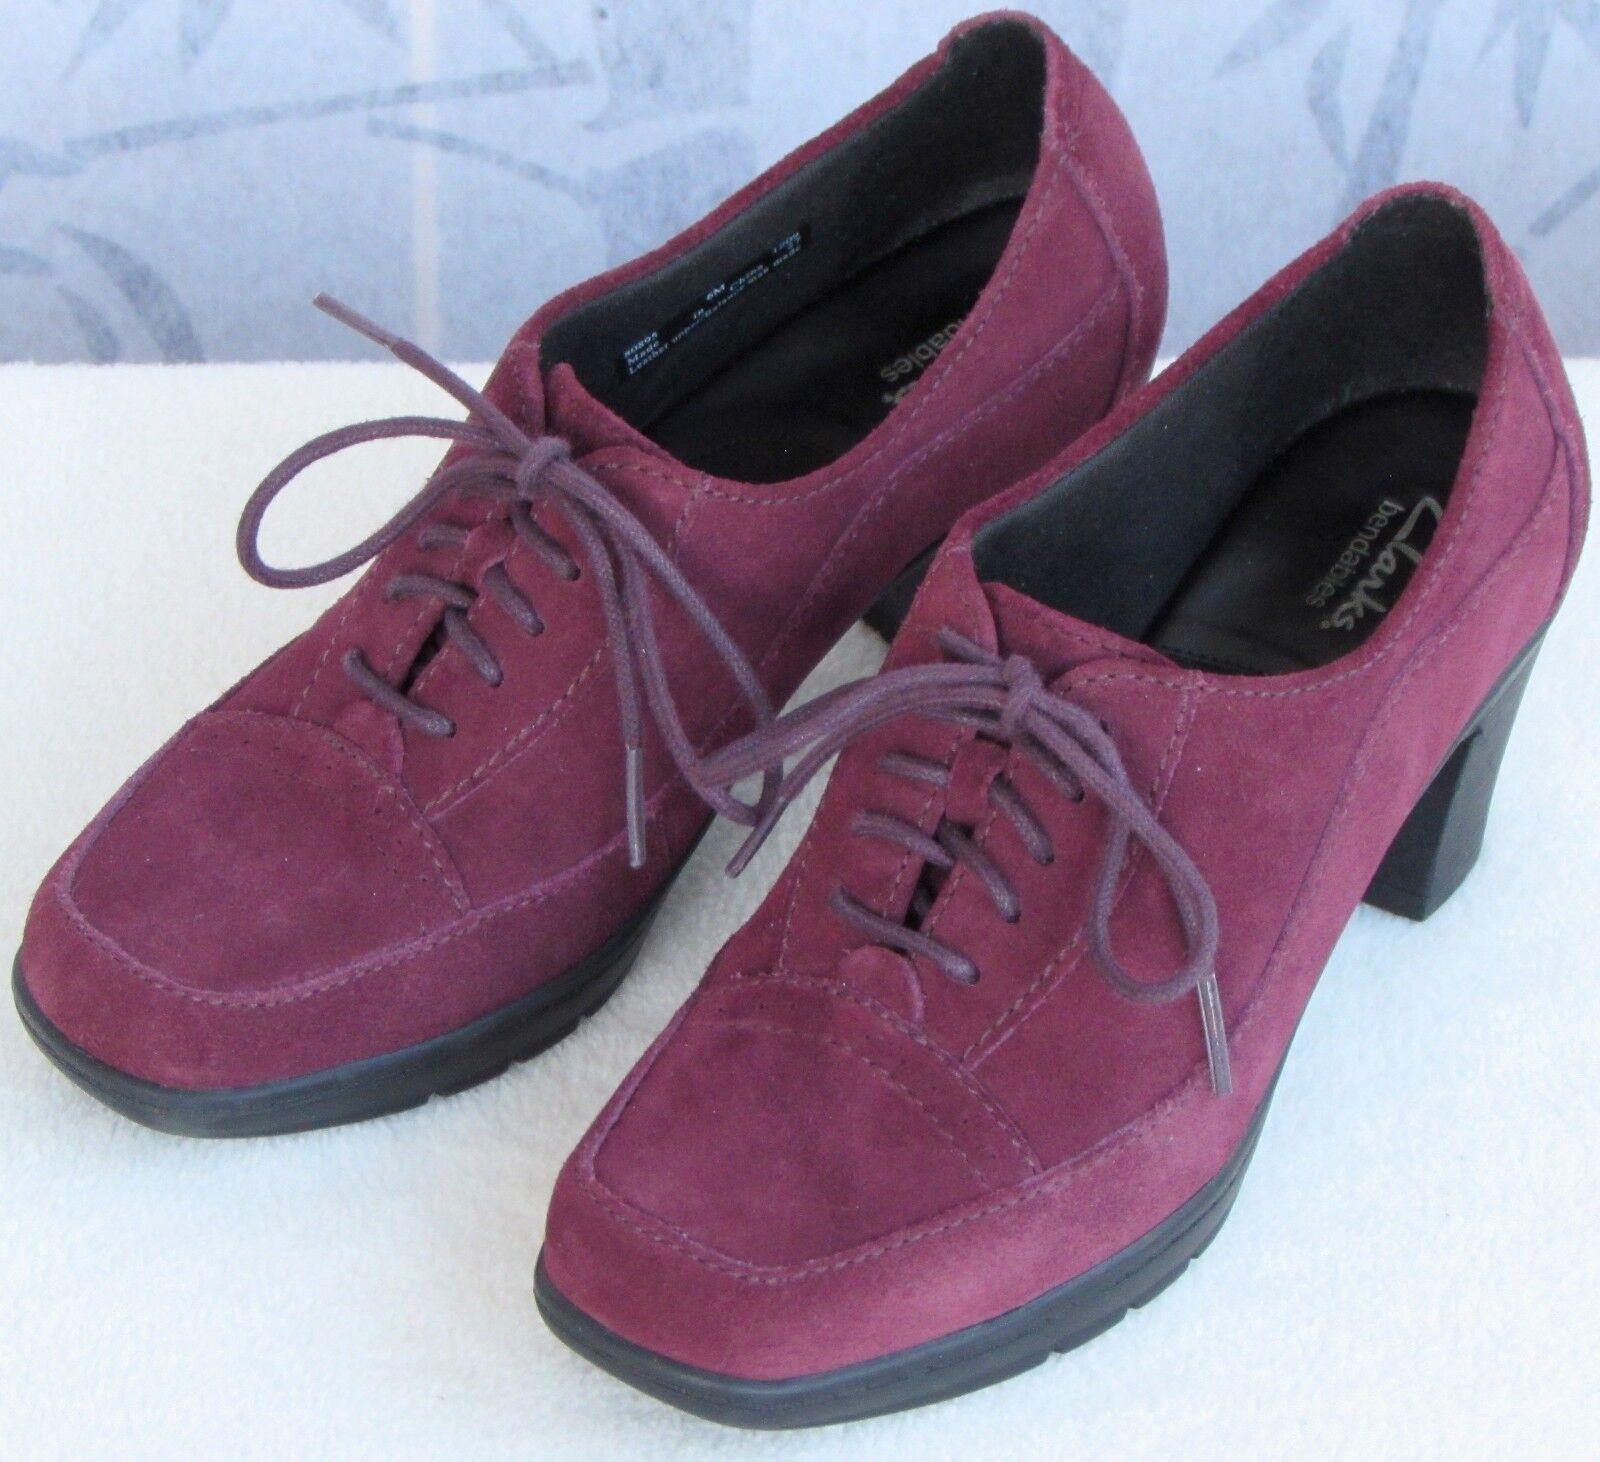 6 M   Clarks Honest Women Burgundy Suede Leather Lace-Up Block Heel Oxford Pump